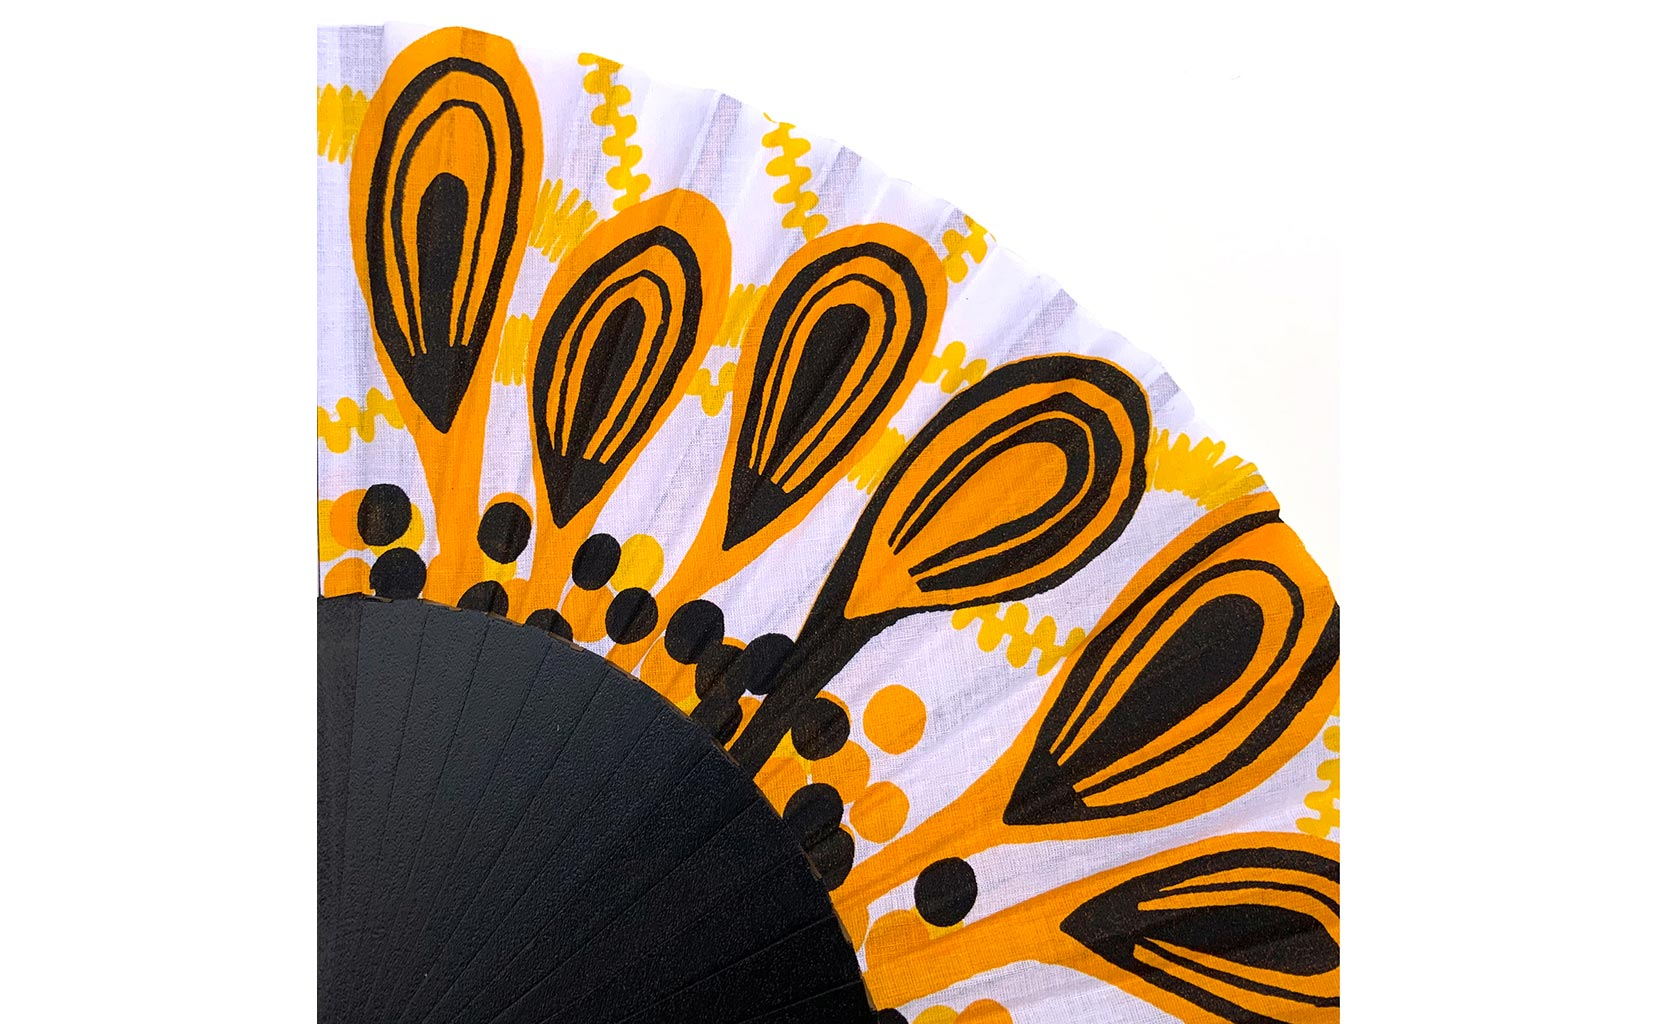 © courant d'air 04 © Magali Bardos éventail handfan abanicos motif pattern sérigraphie sur tissus silkscreen noir jaune paon